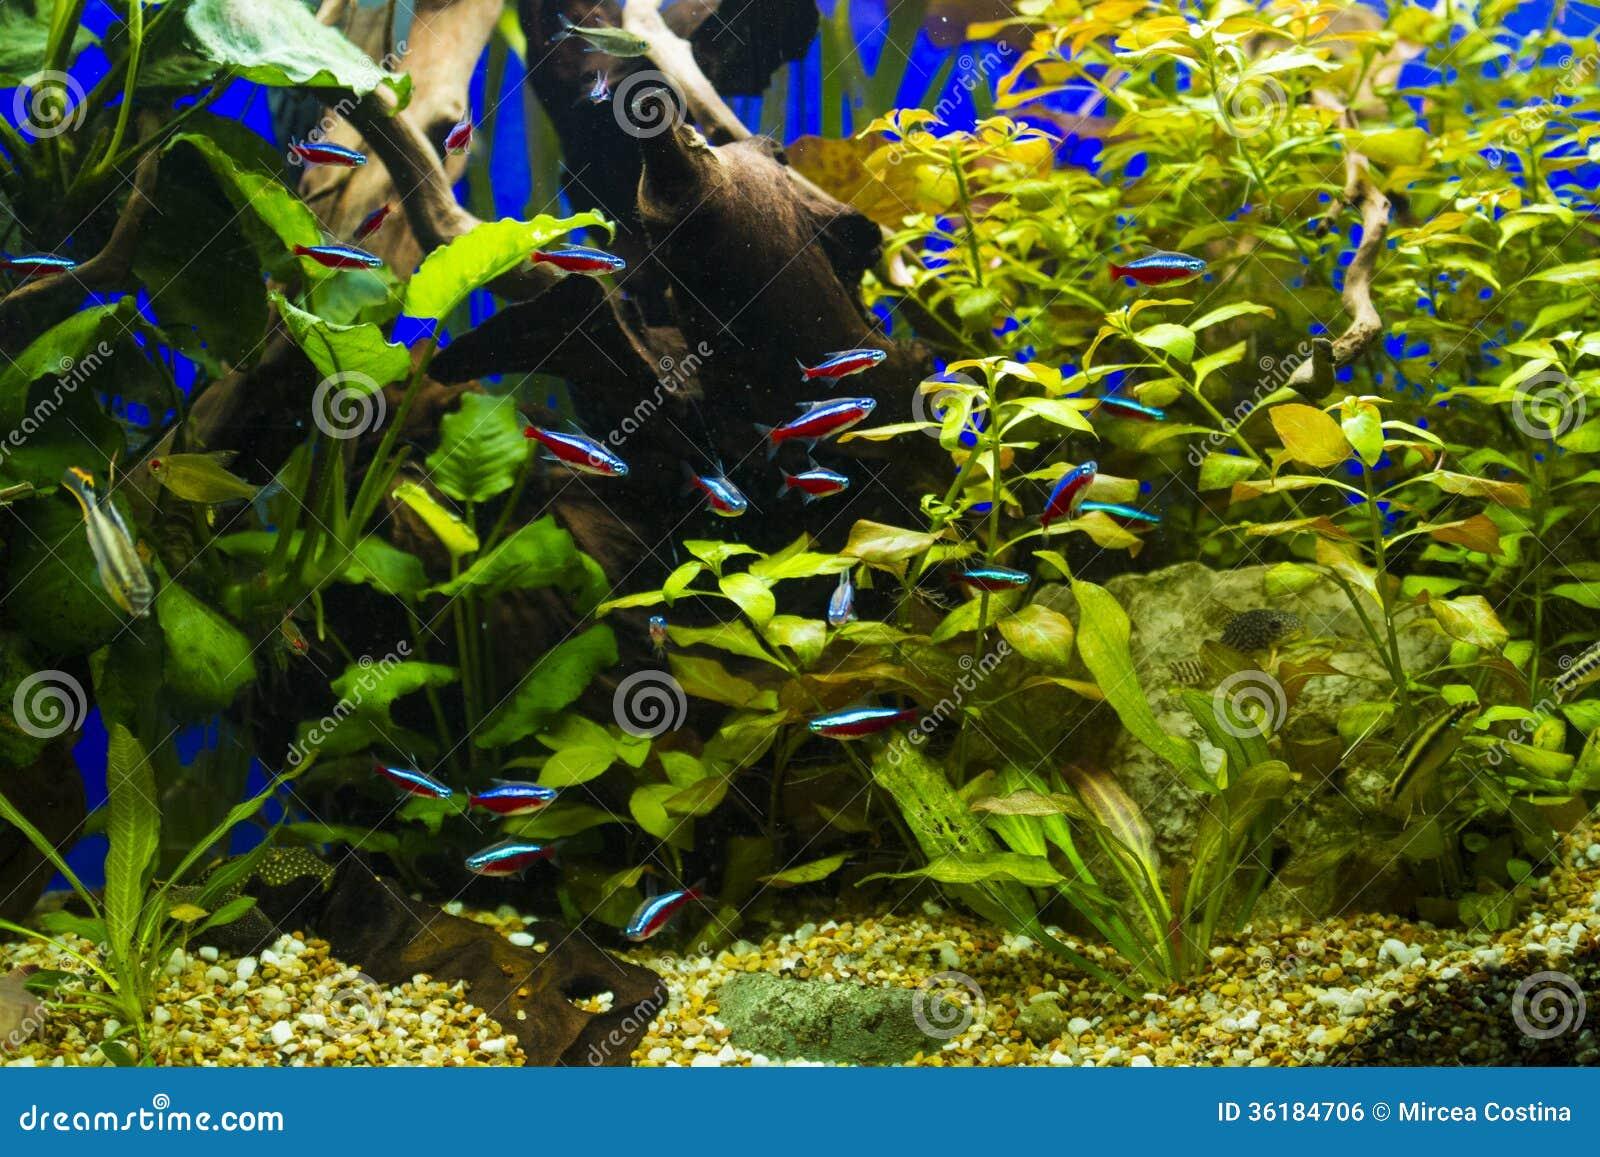 image libre de droits cardinal fishes in freshwater aquarium image 36184706. Black Bedroom Furniture Sets. Home Design Ideas